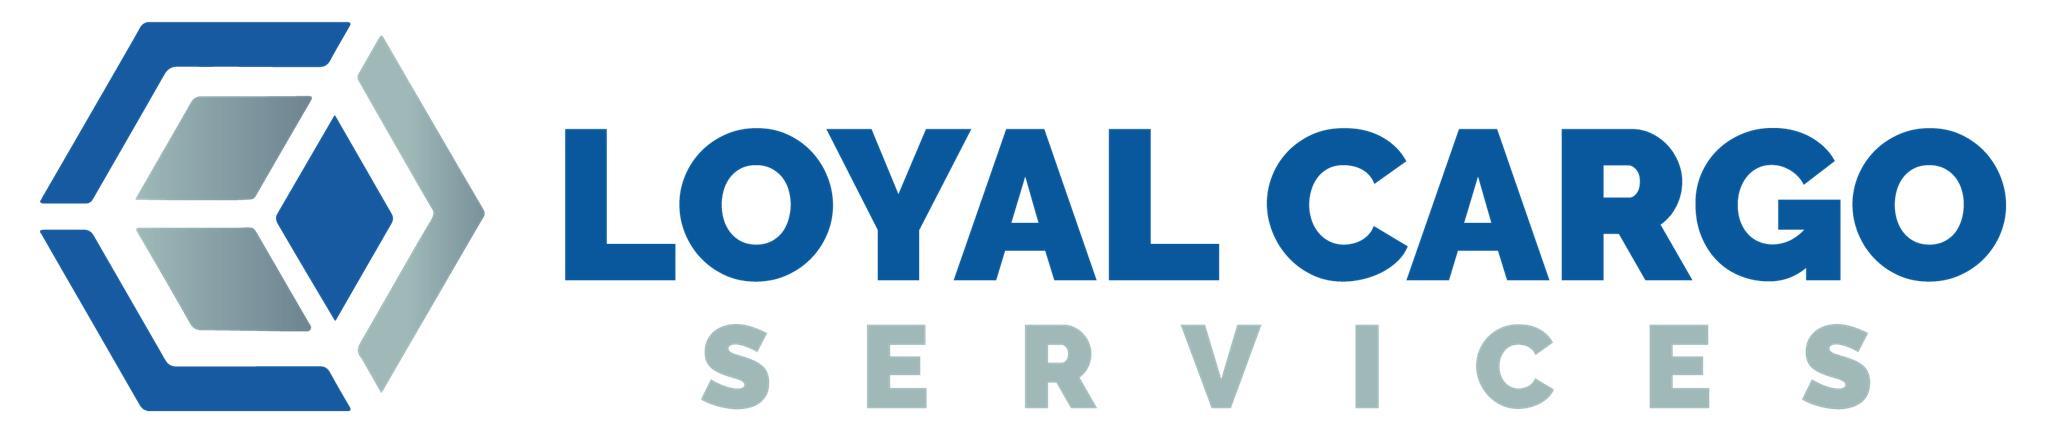 Loyal Cargo Services